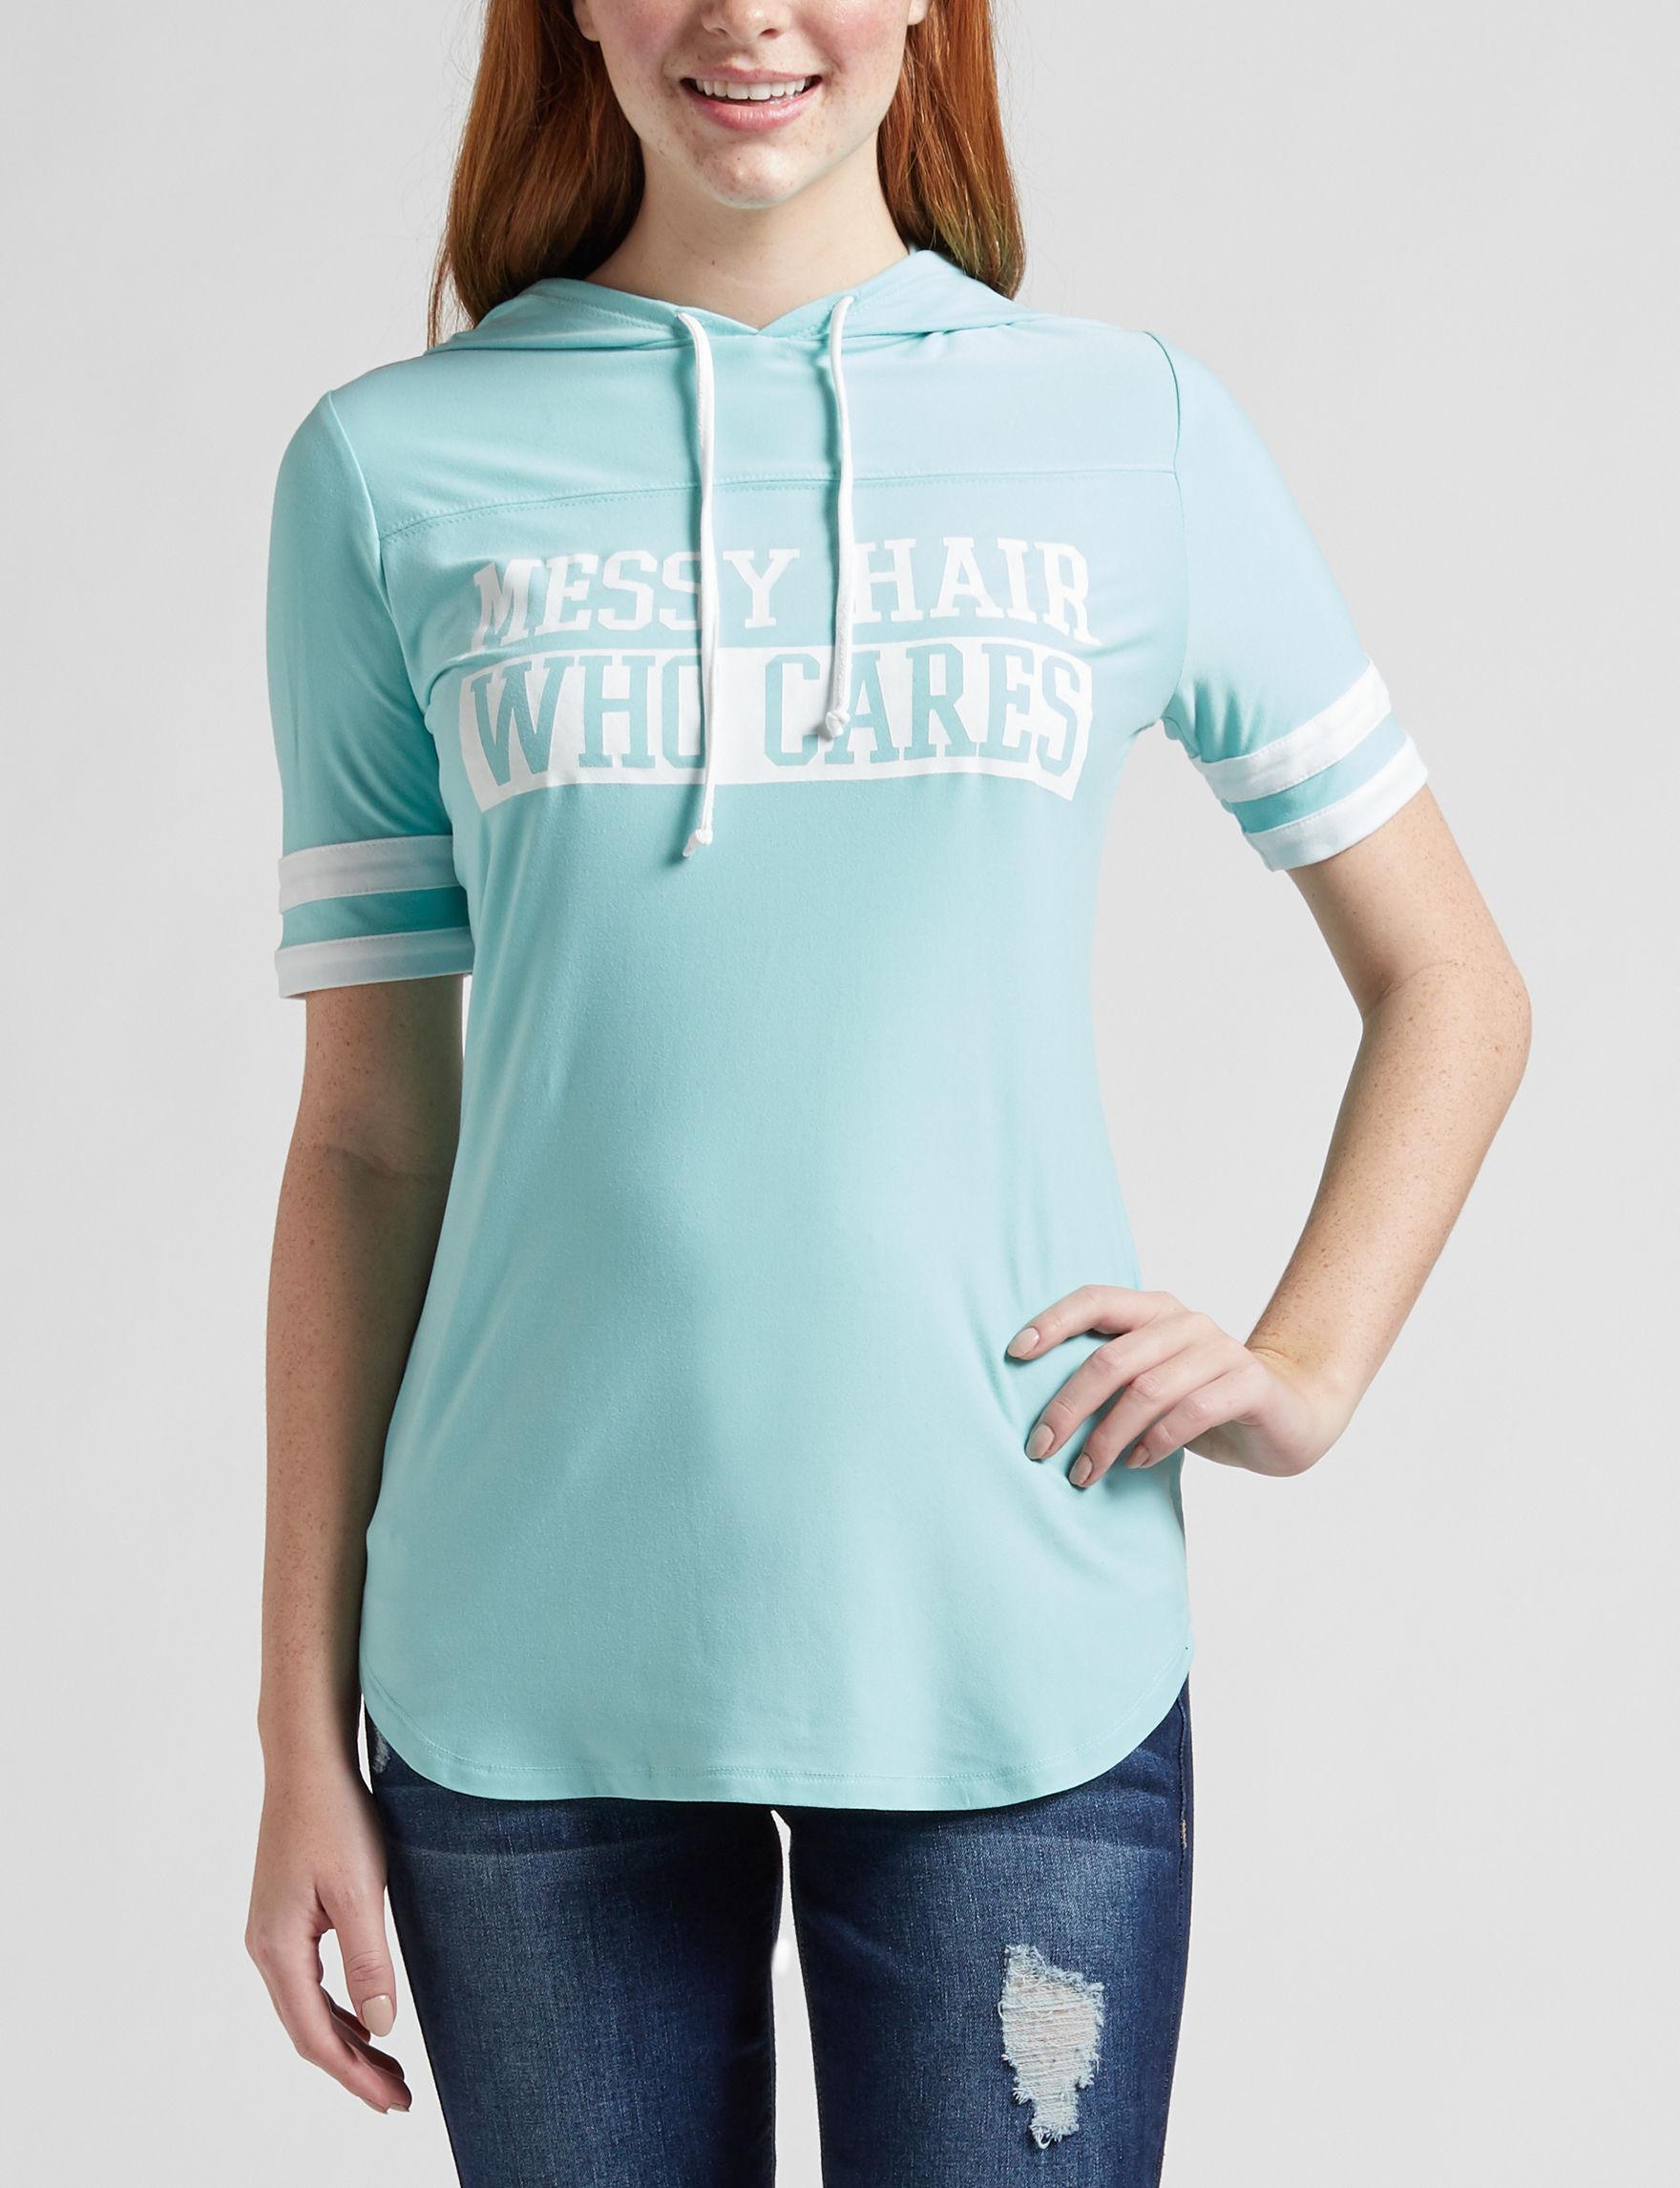 Ultra Flirt Teal Shirts & Blouses